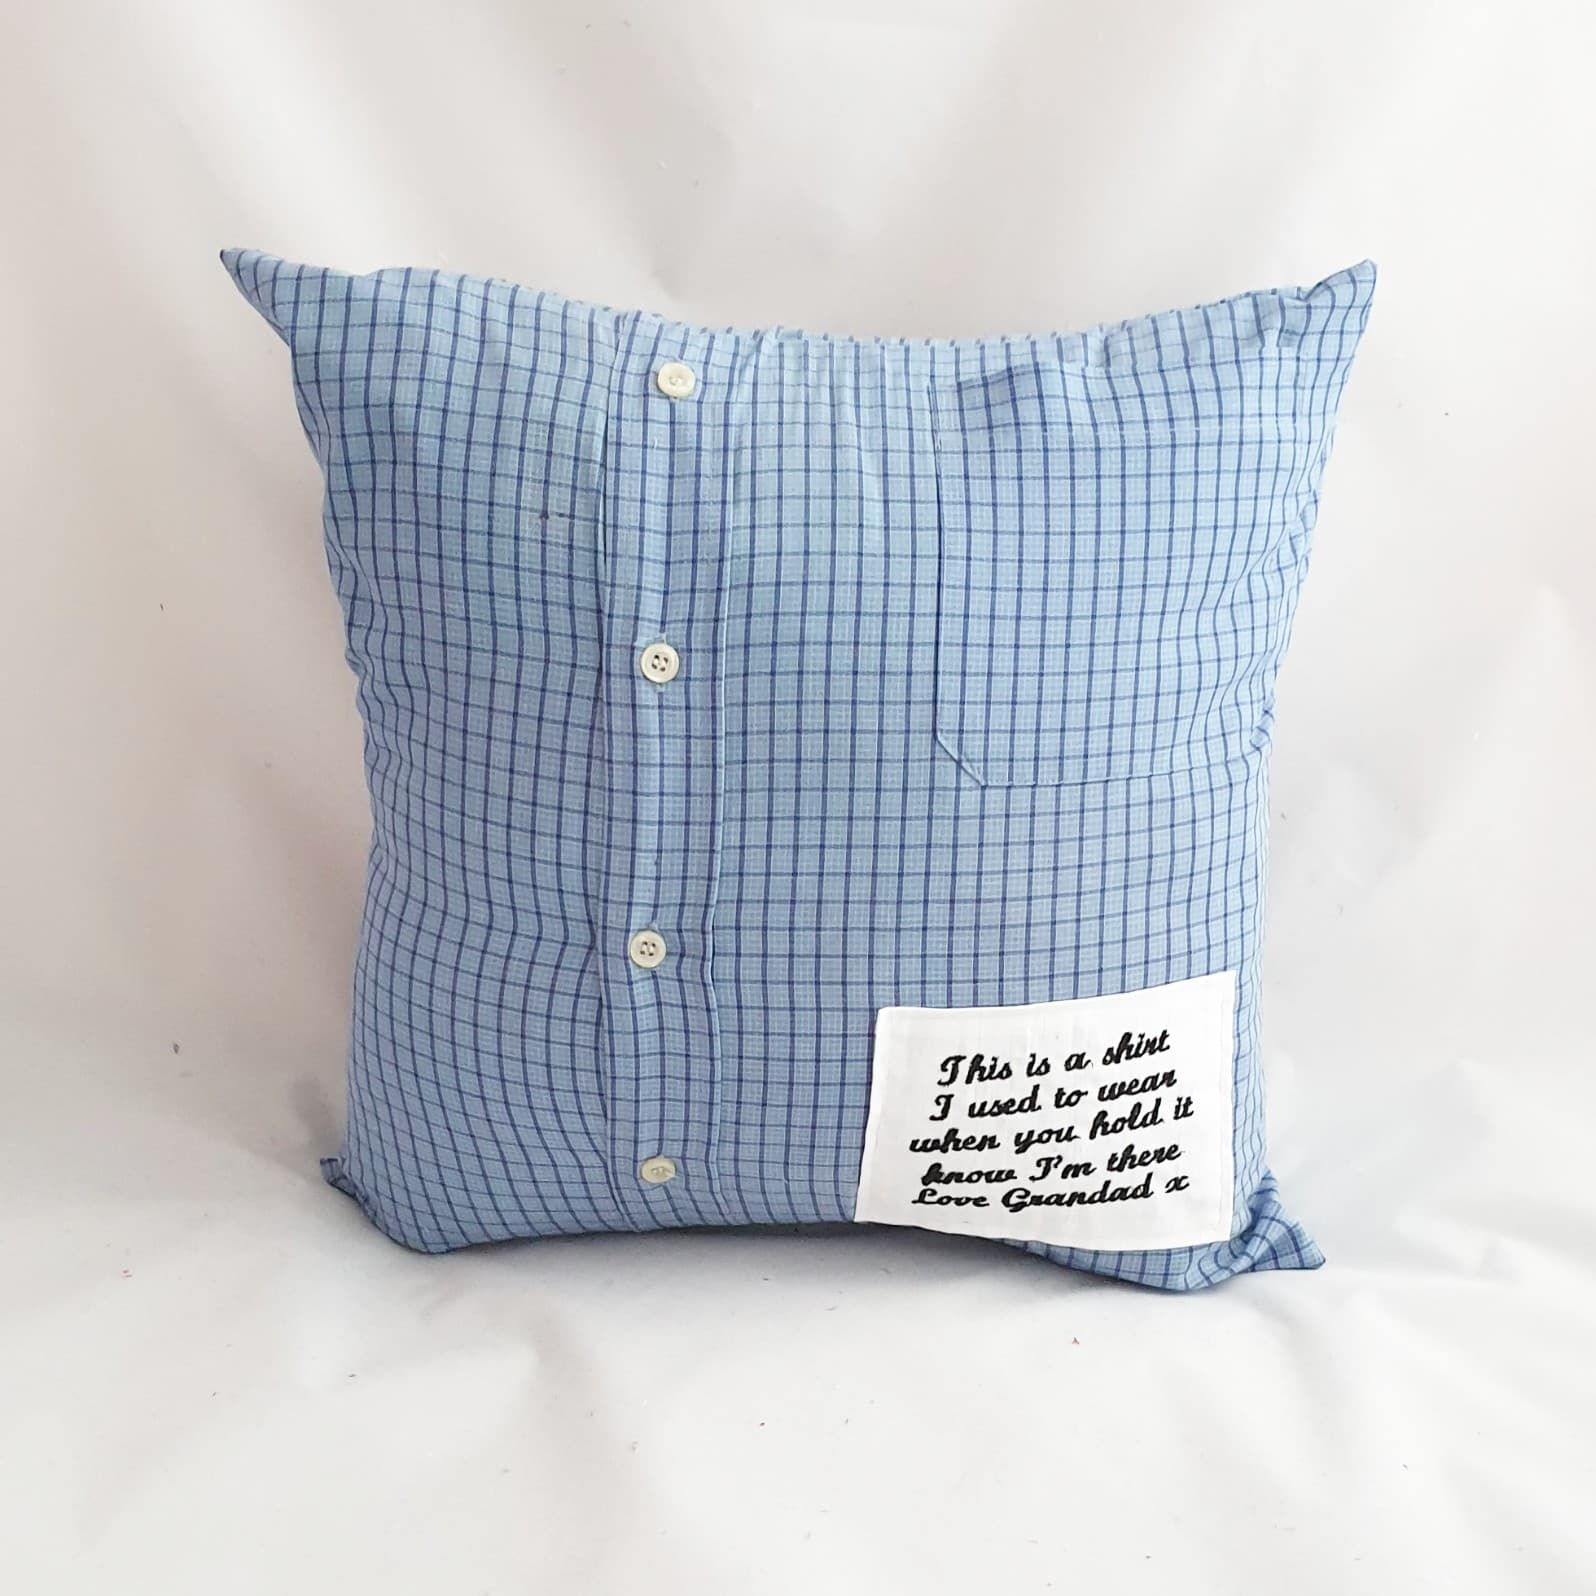 memory cushion made from shirt